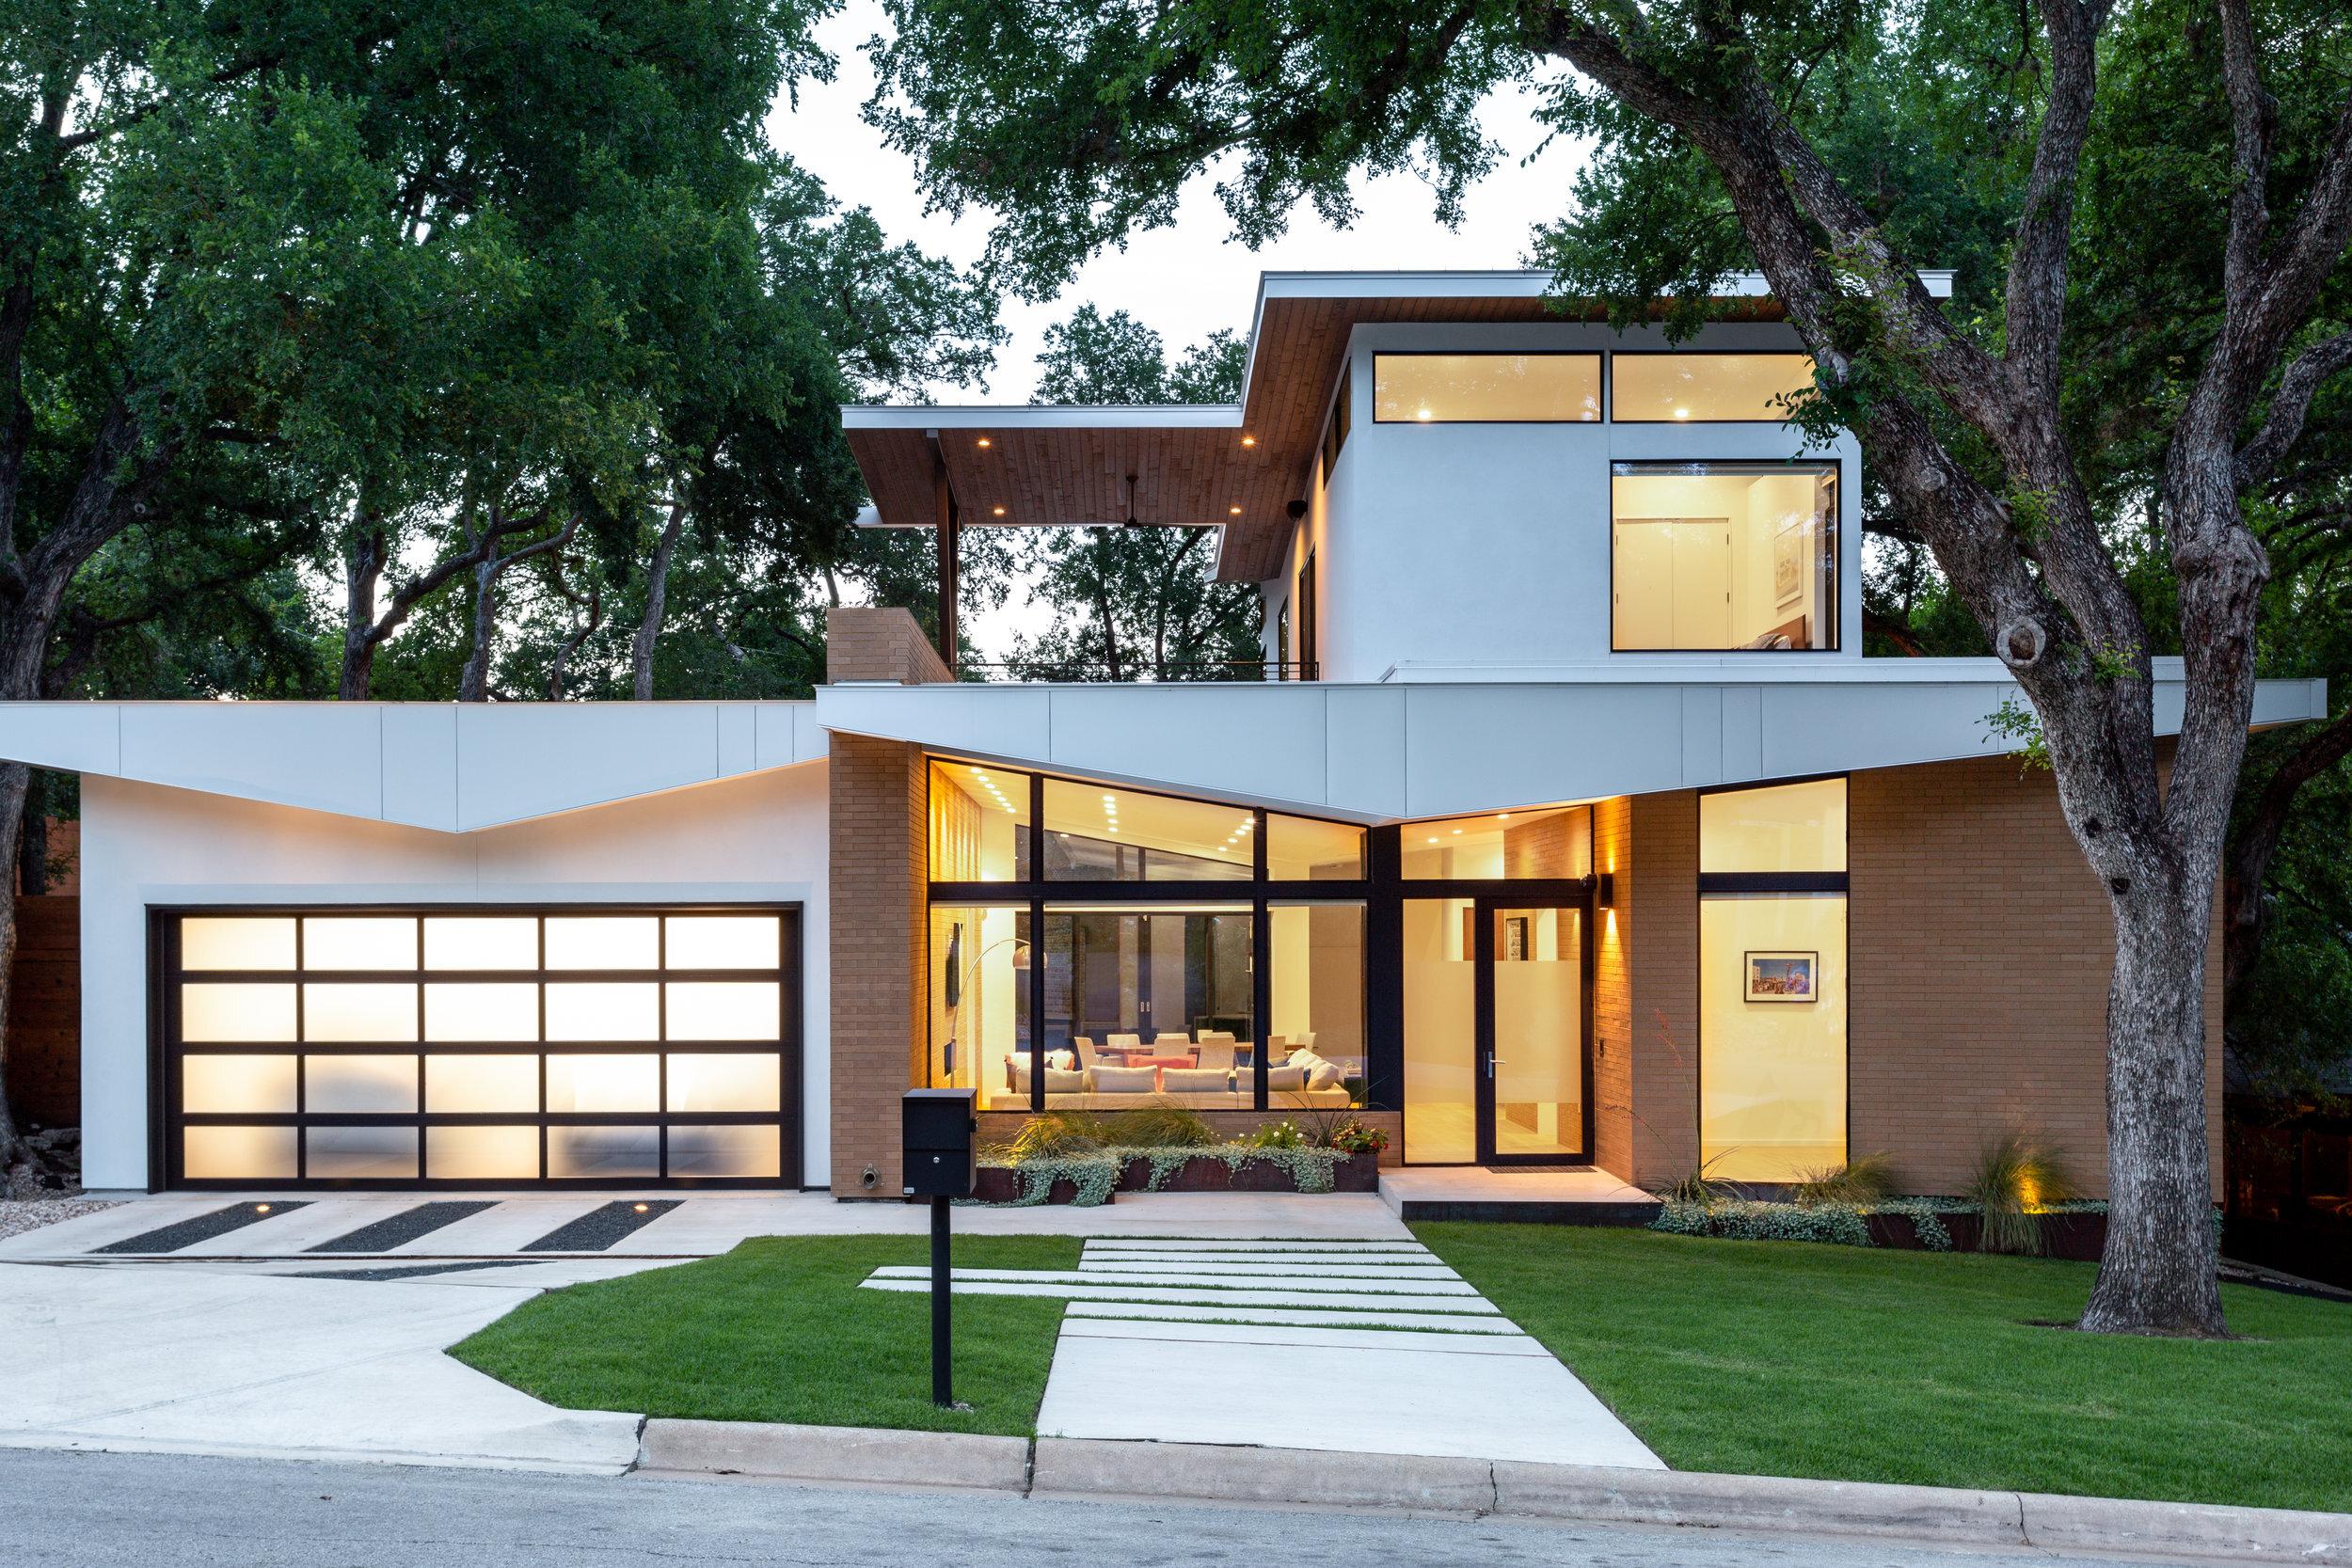 CoXist_OakPark_Austin_Architect_ReagenTaylorPhotography-15.jpg